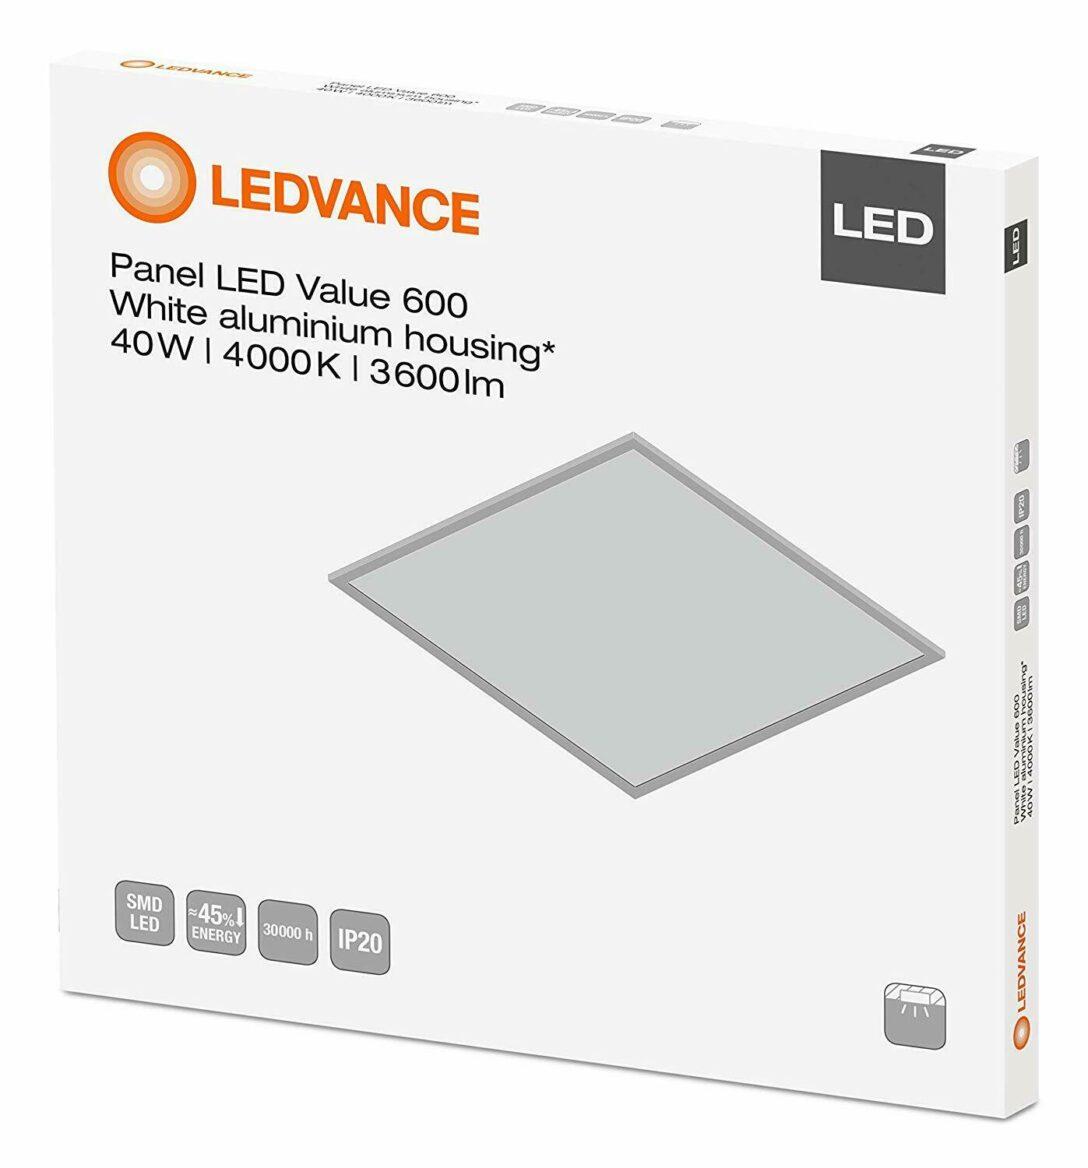 Large Size of Osram Led Panel Table Lamp Ledvance 40w 600x600   4000k Surface Mount Kit Paneli 60x60 Pdf 32w (600 X 600mm) Planon Frameless 600x600mm 600 Cool Wei Ebay Wohnzimmer Osram Led Panel